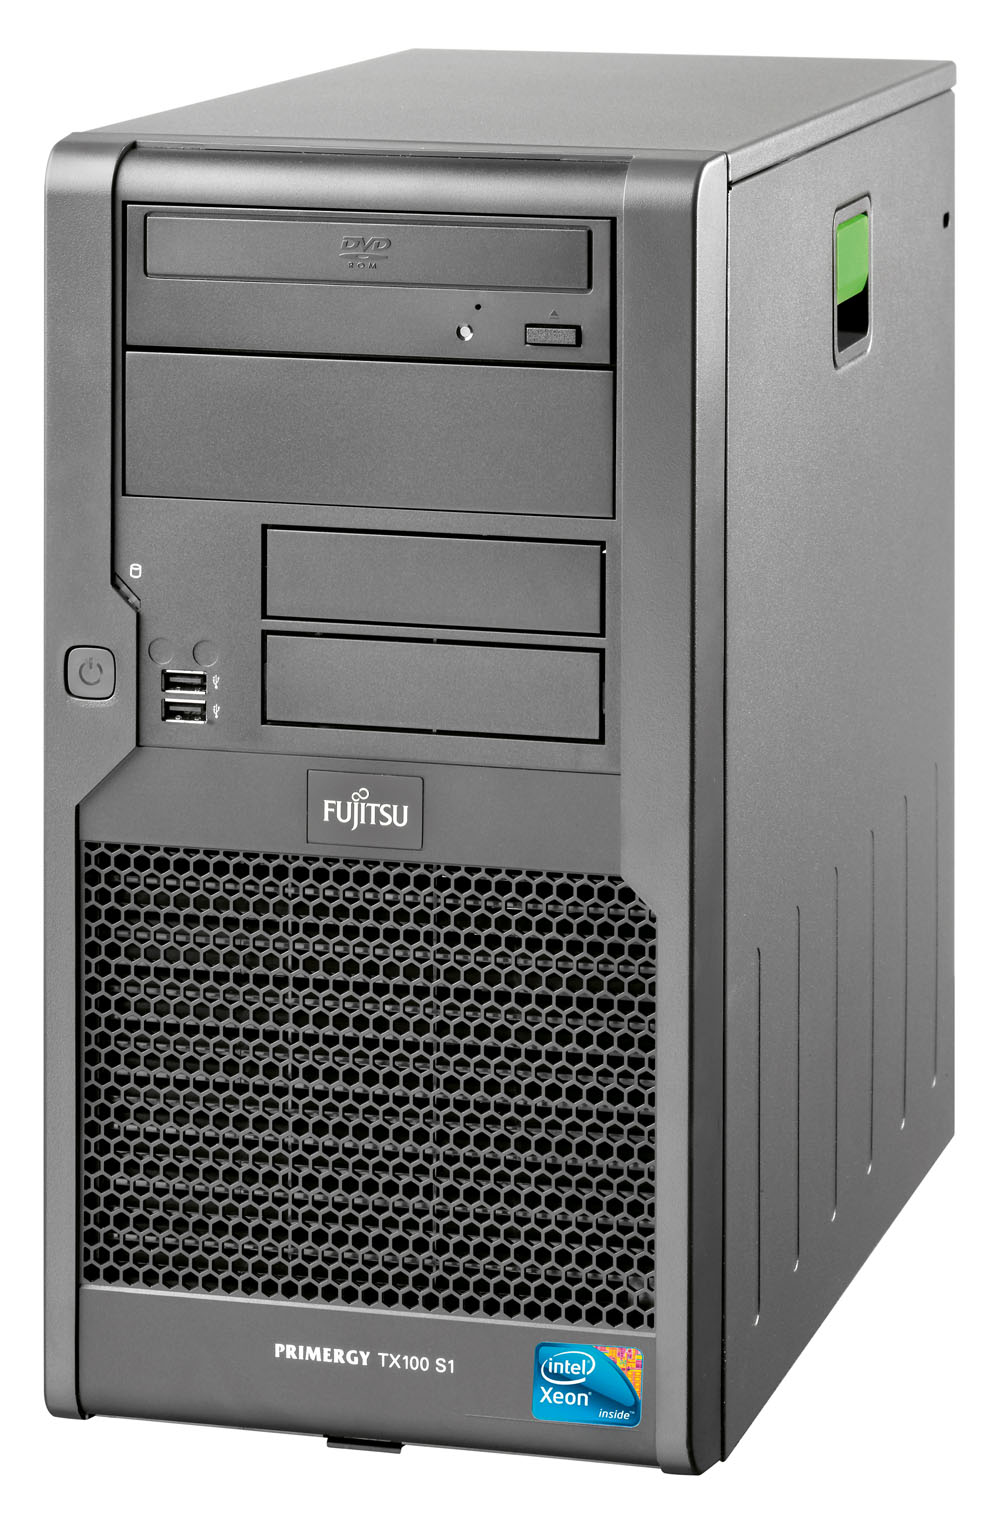 Сервер Fujitsu PRIMERGY TX100S1 E5200 NHP SATA (Tower P2.5GHzDC, 2Mb, 1x1GB, 1x160GB NHP SATA(up to 2), RAID 0,1, DVD, GigEth, noTPM, noPwrCord )